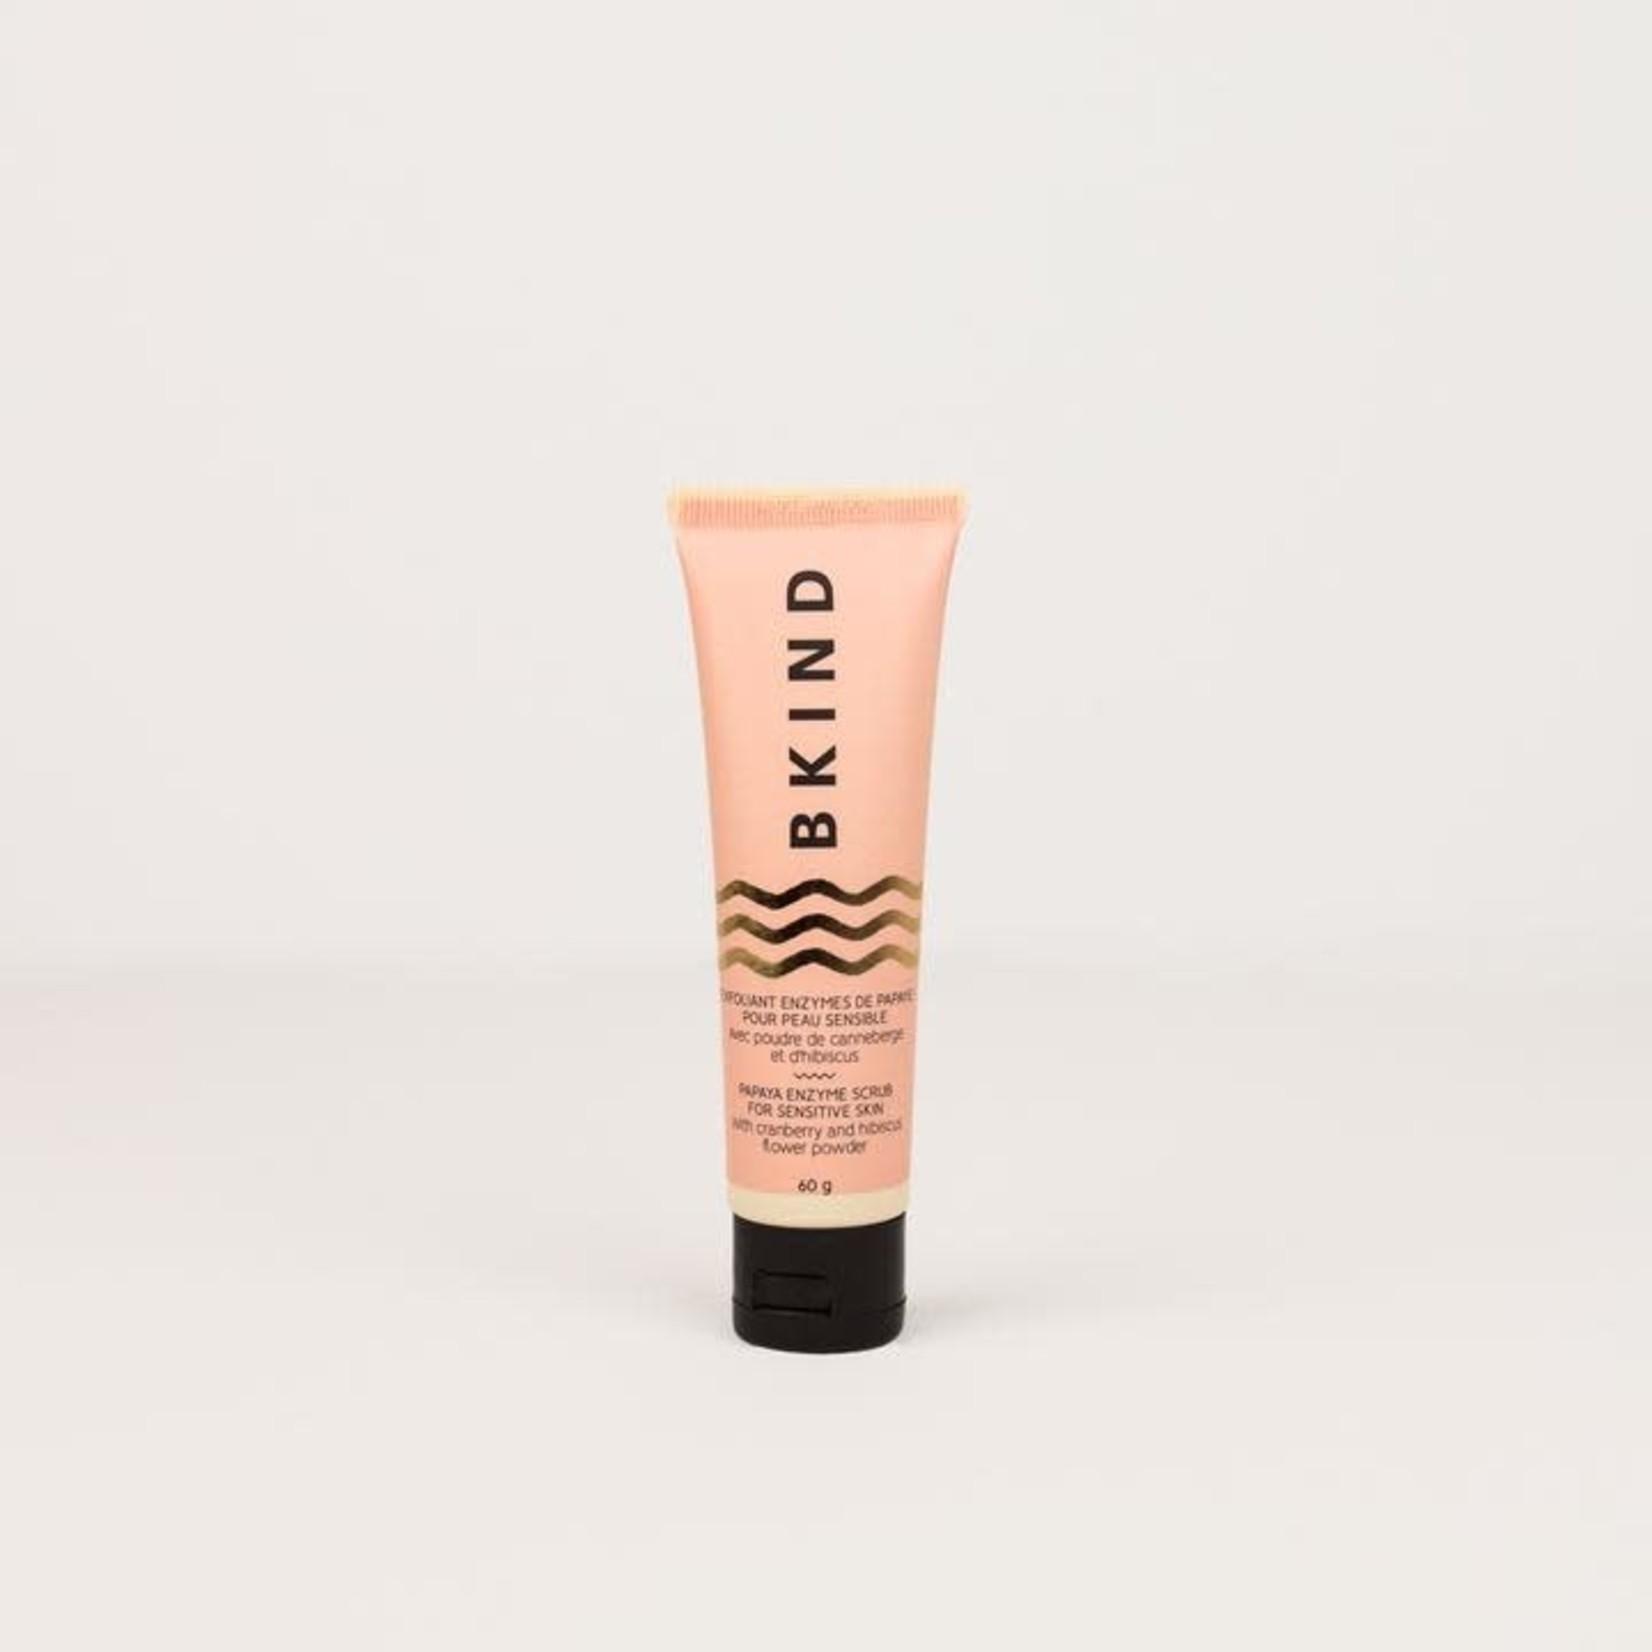 BKIND BKIND -  Exfoliant visage /  Peau sensible